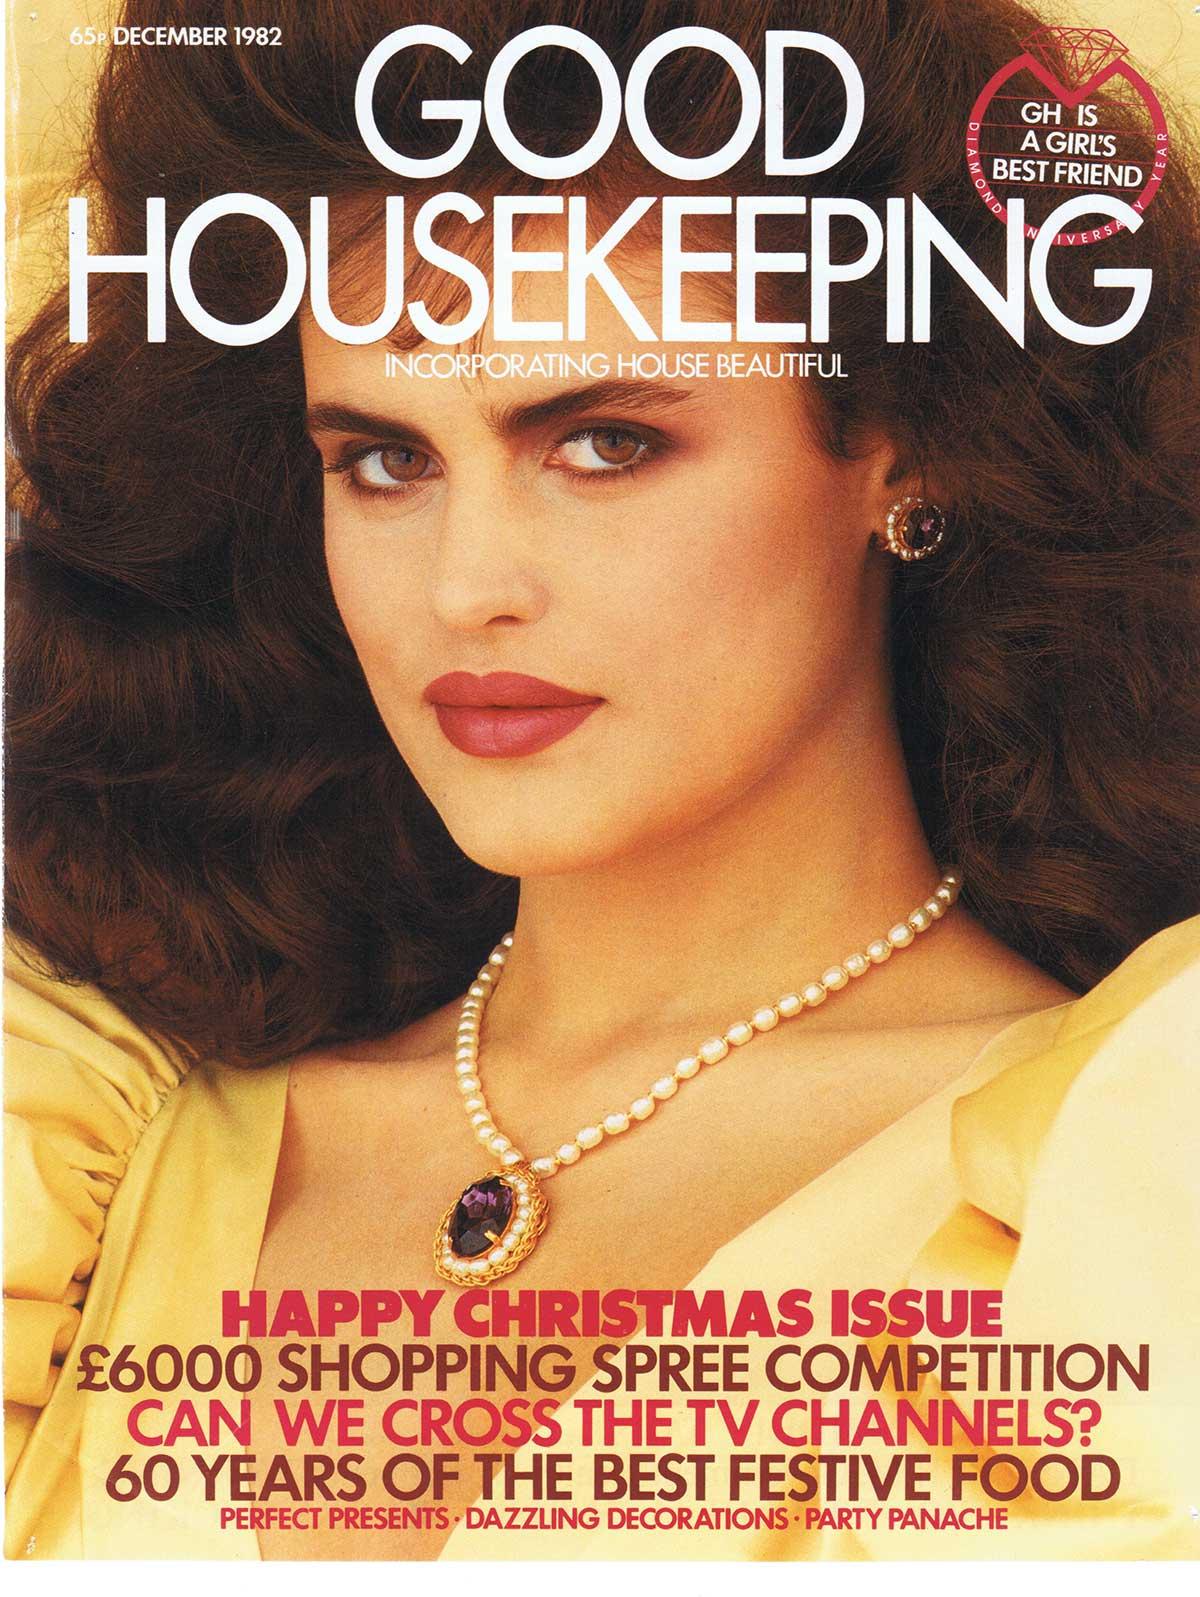 justina-vail-evans-good-housekeeping-cover-1982